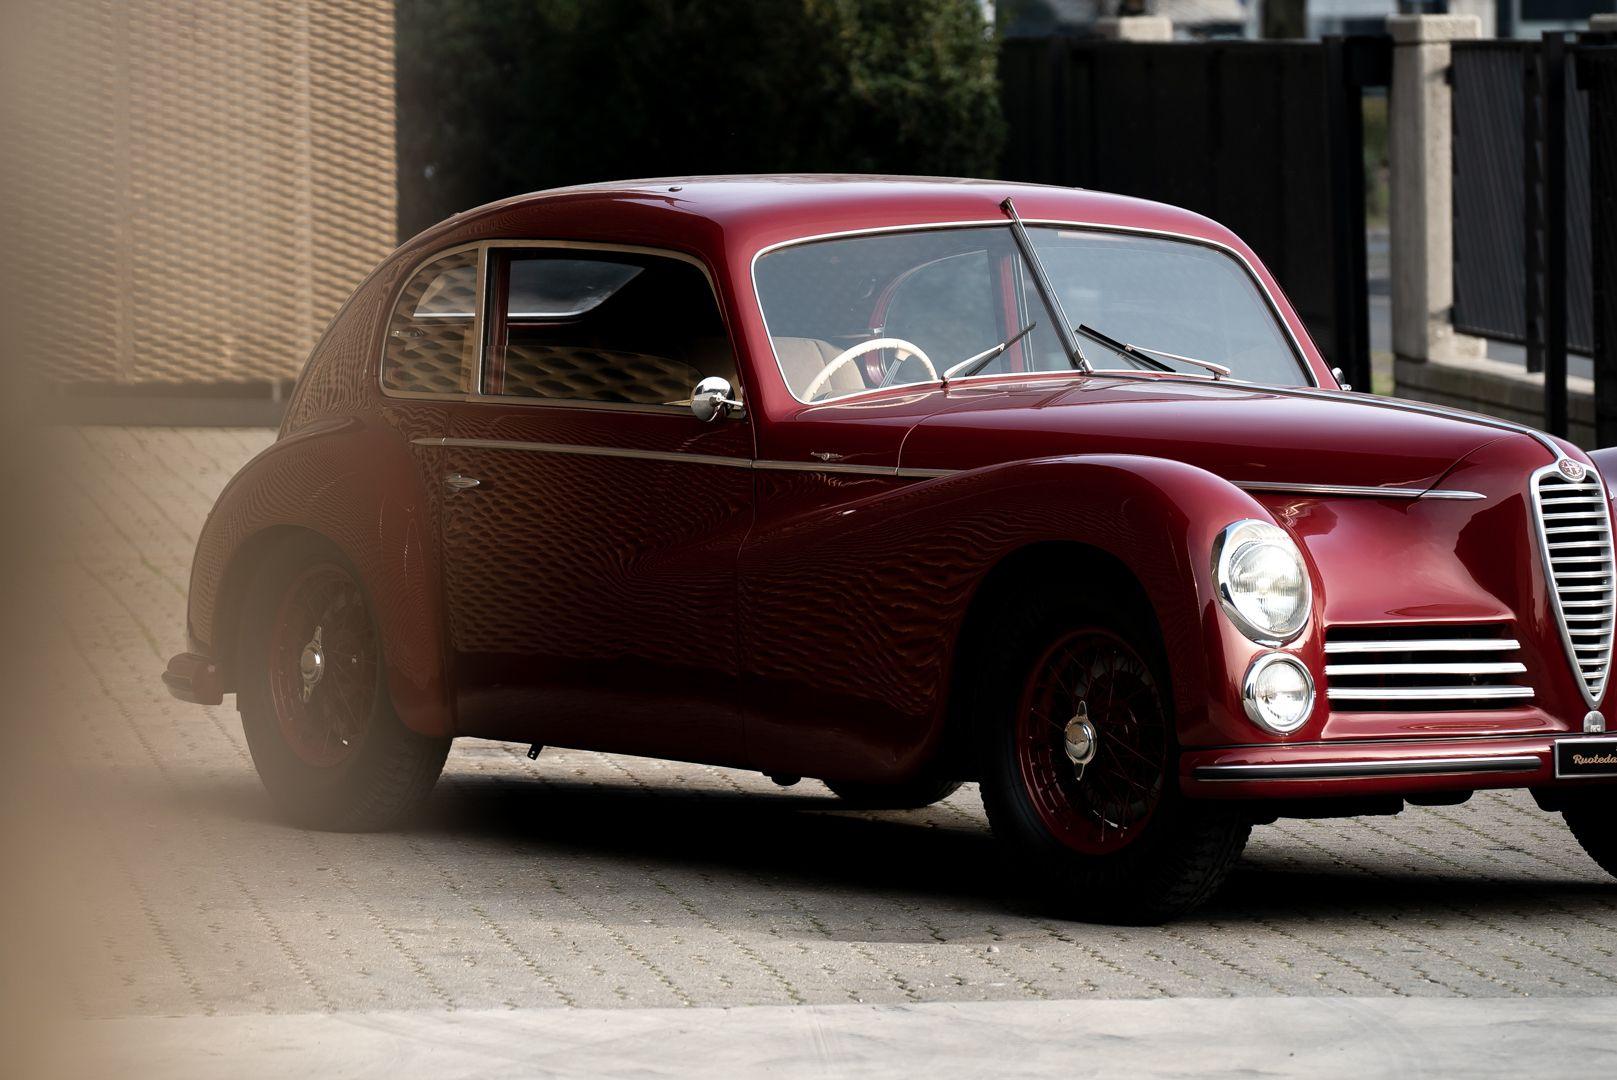 1947 Alfa Romeo Freccia d'oro 6C 2500 Sport 61685